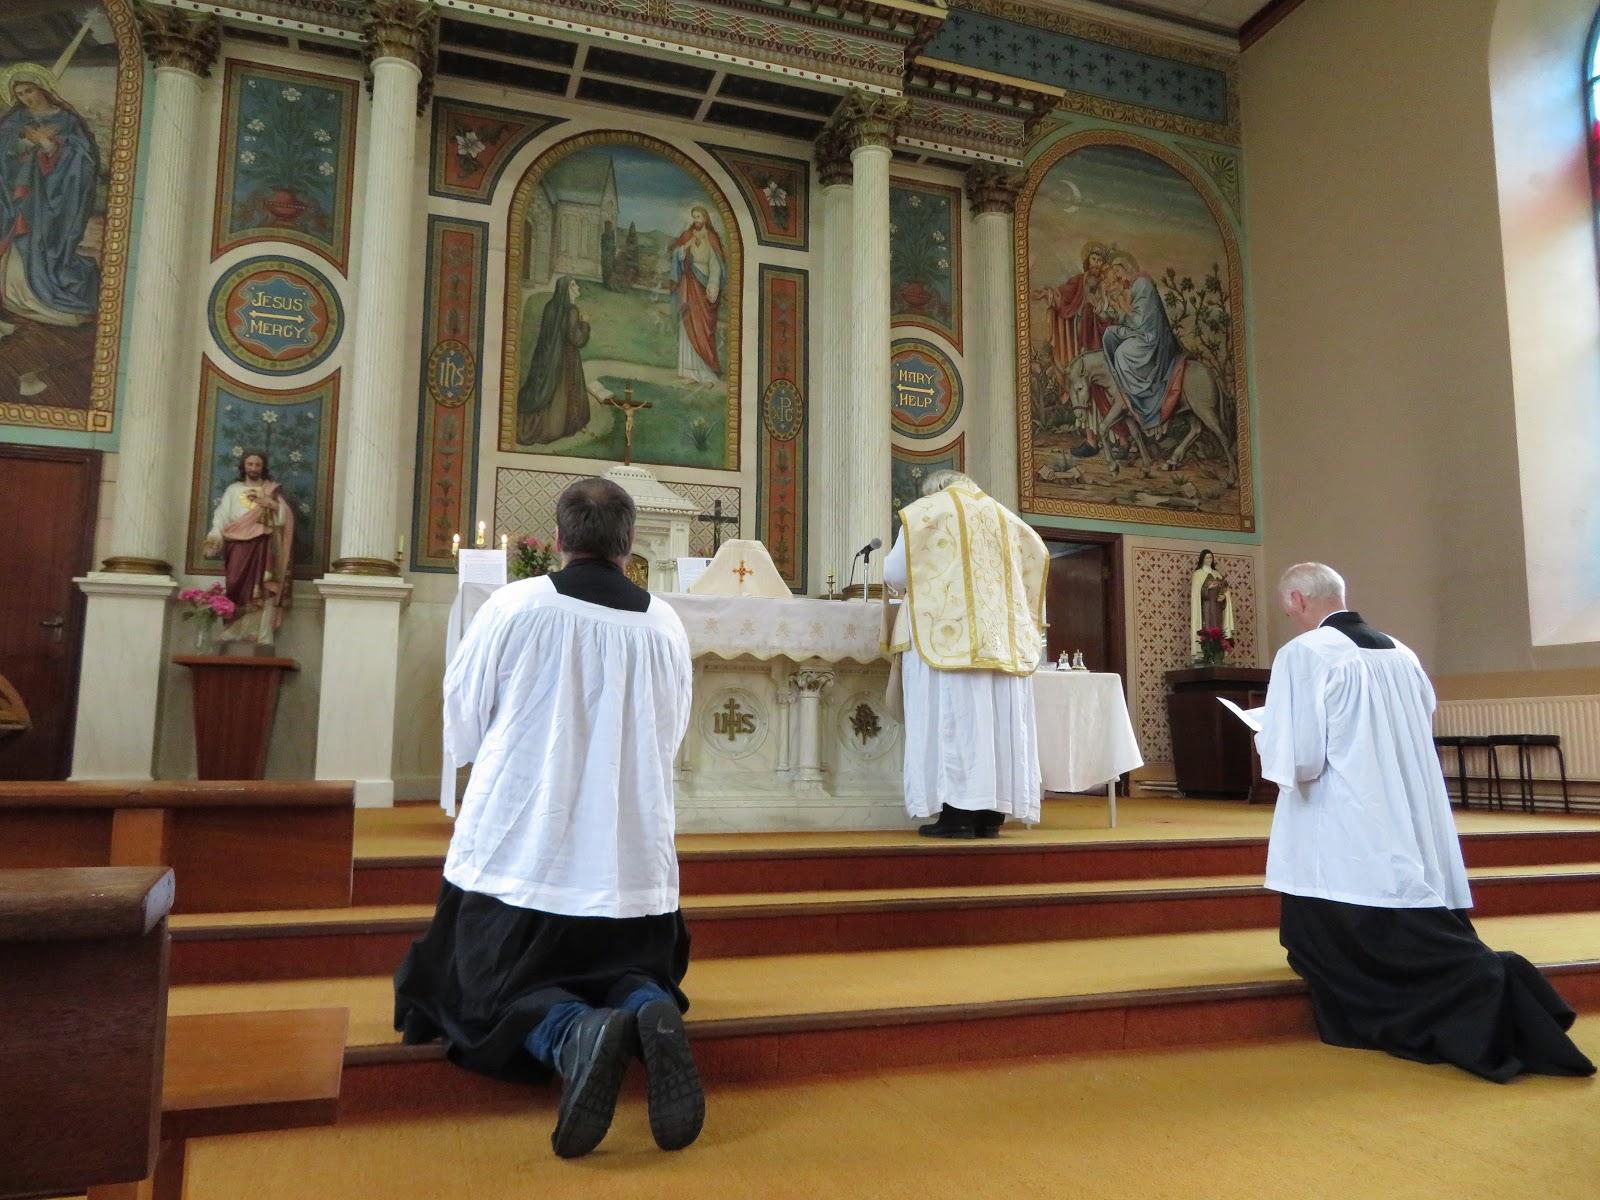 saint marys latin singles Multimedia tutorial with videos, photos, and audio of the tridentine latin mass according to the 1962 missale romanum (roman missal.